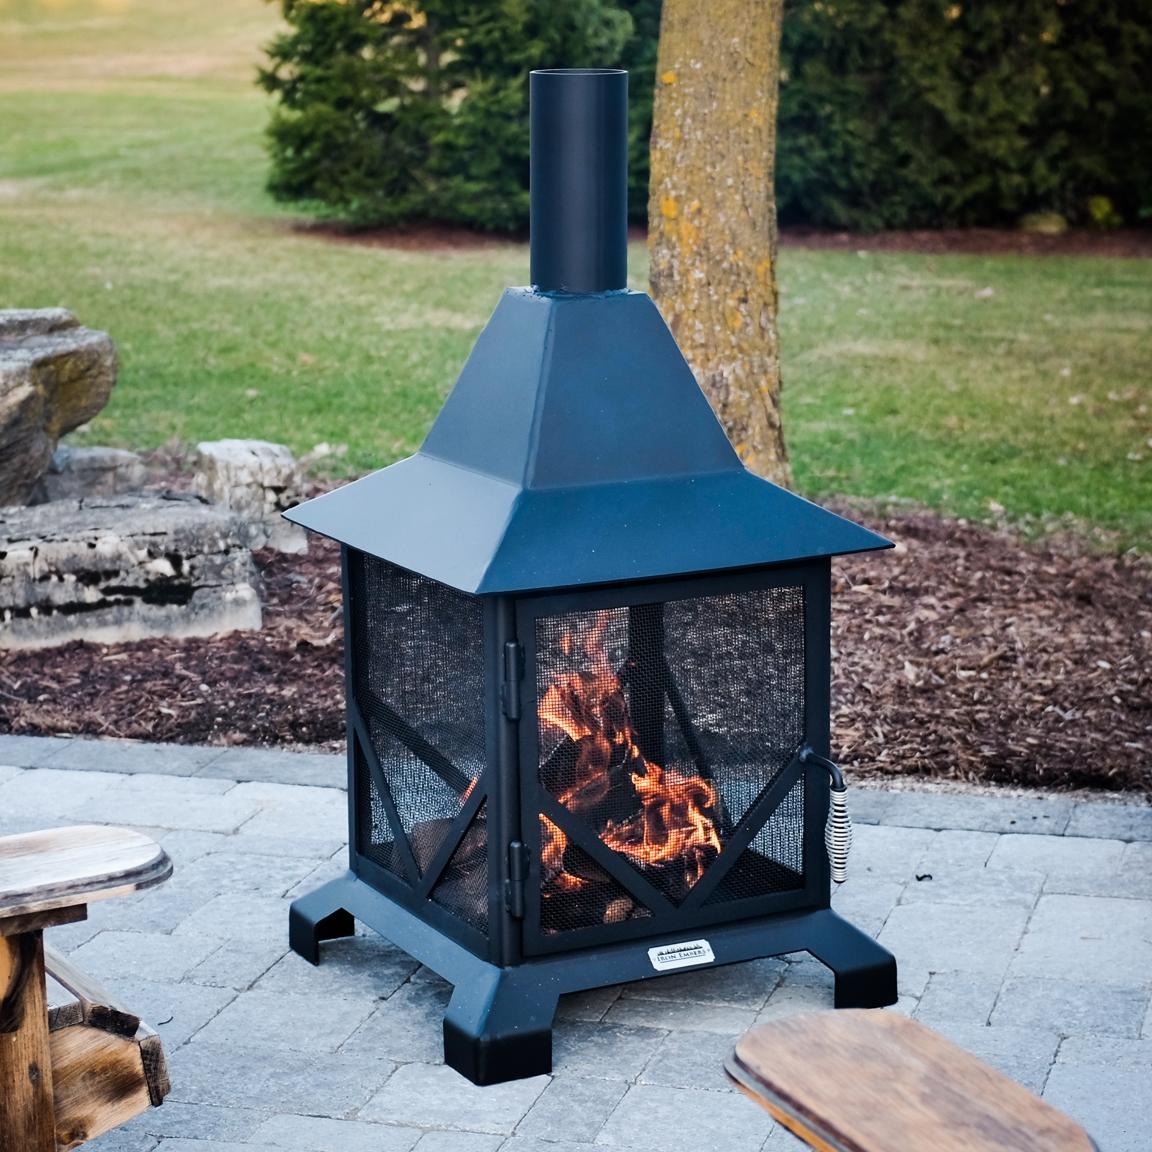 Iron Embers Chiminea Outdoor Fireplace